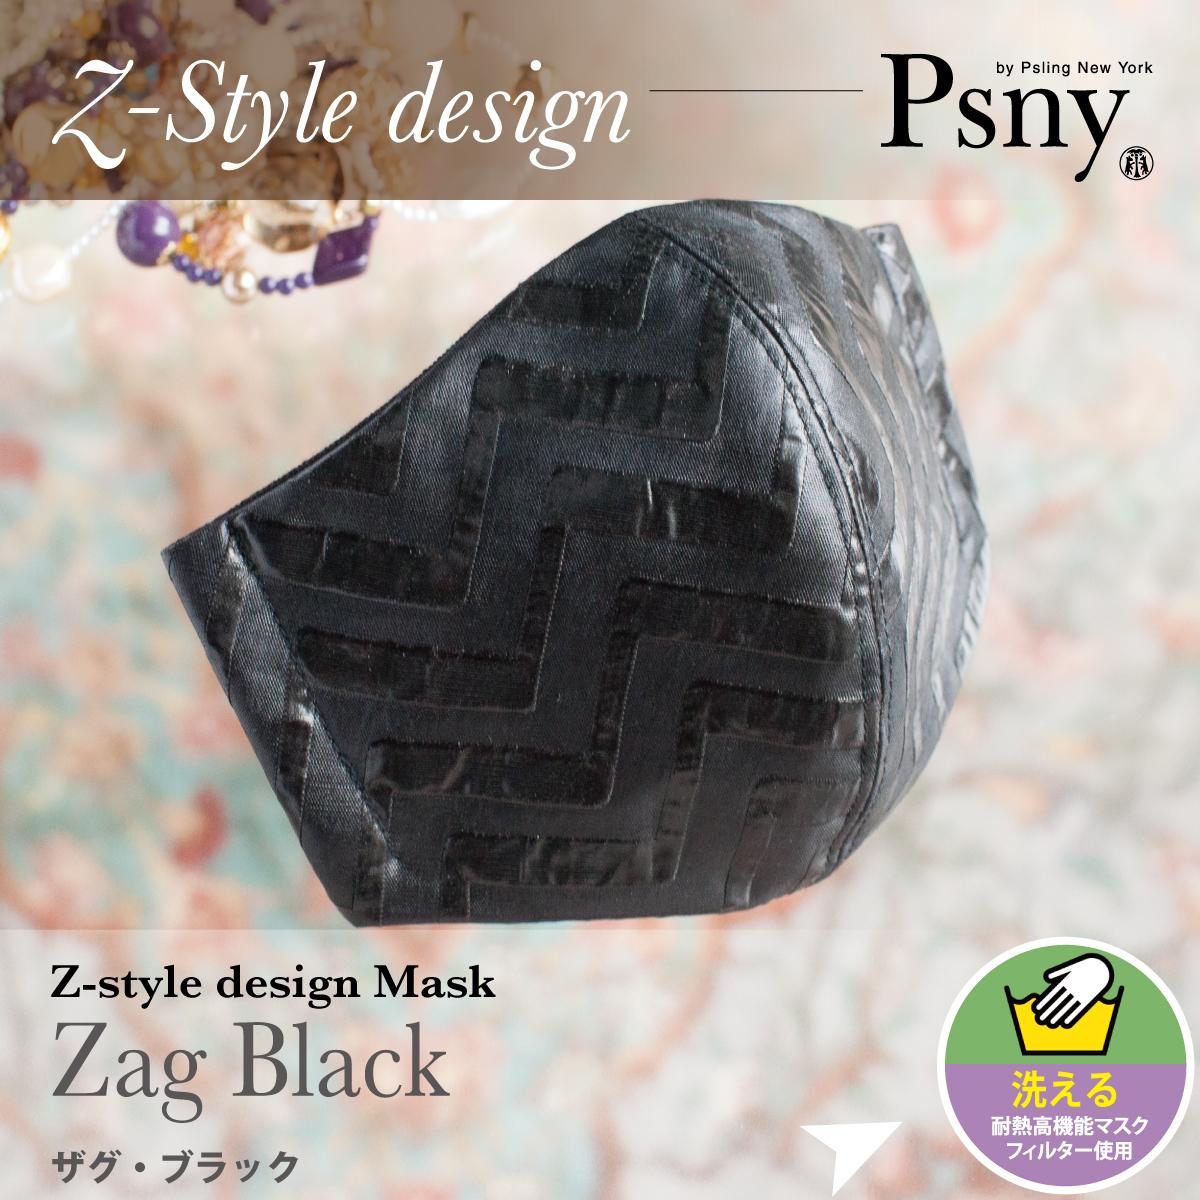 PSNY ザグ・ブラック 花粉 黄砂 洗えるフィルター 立体 マスク 大人用 送料無料